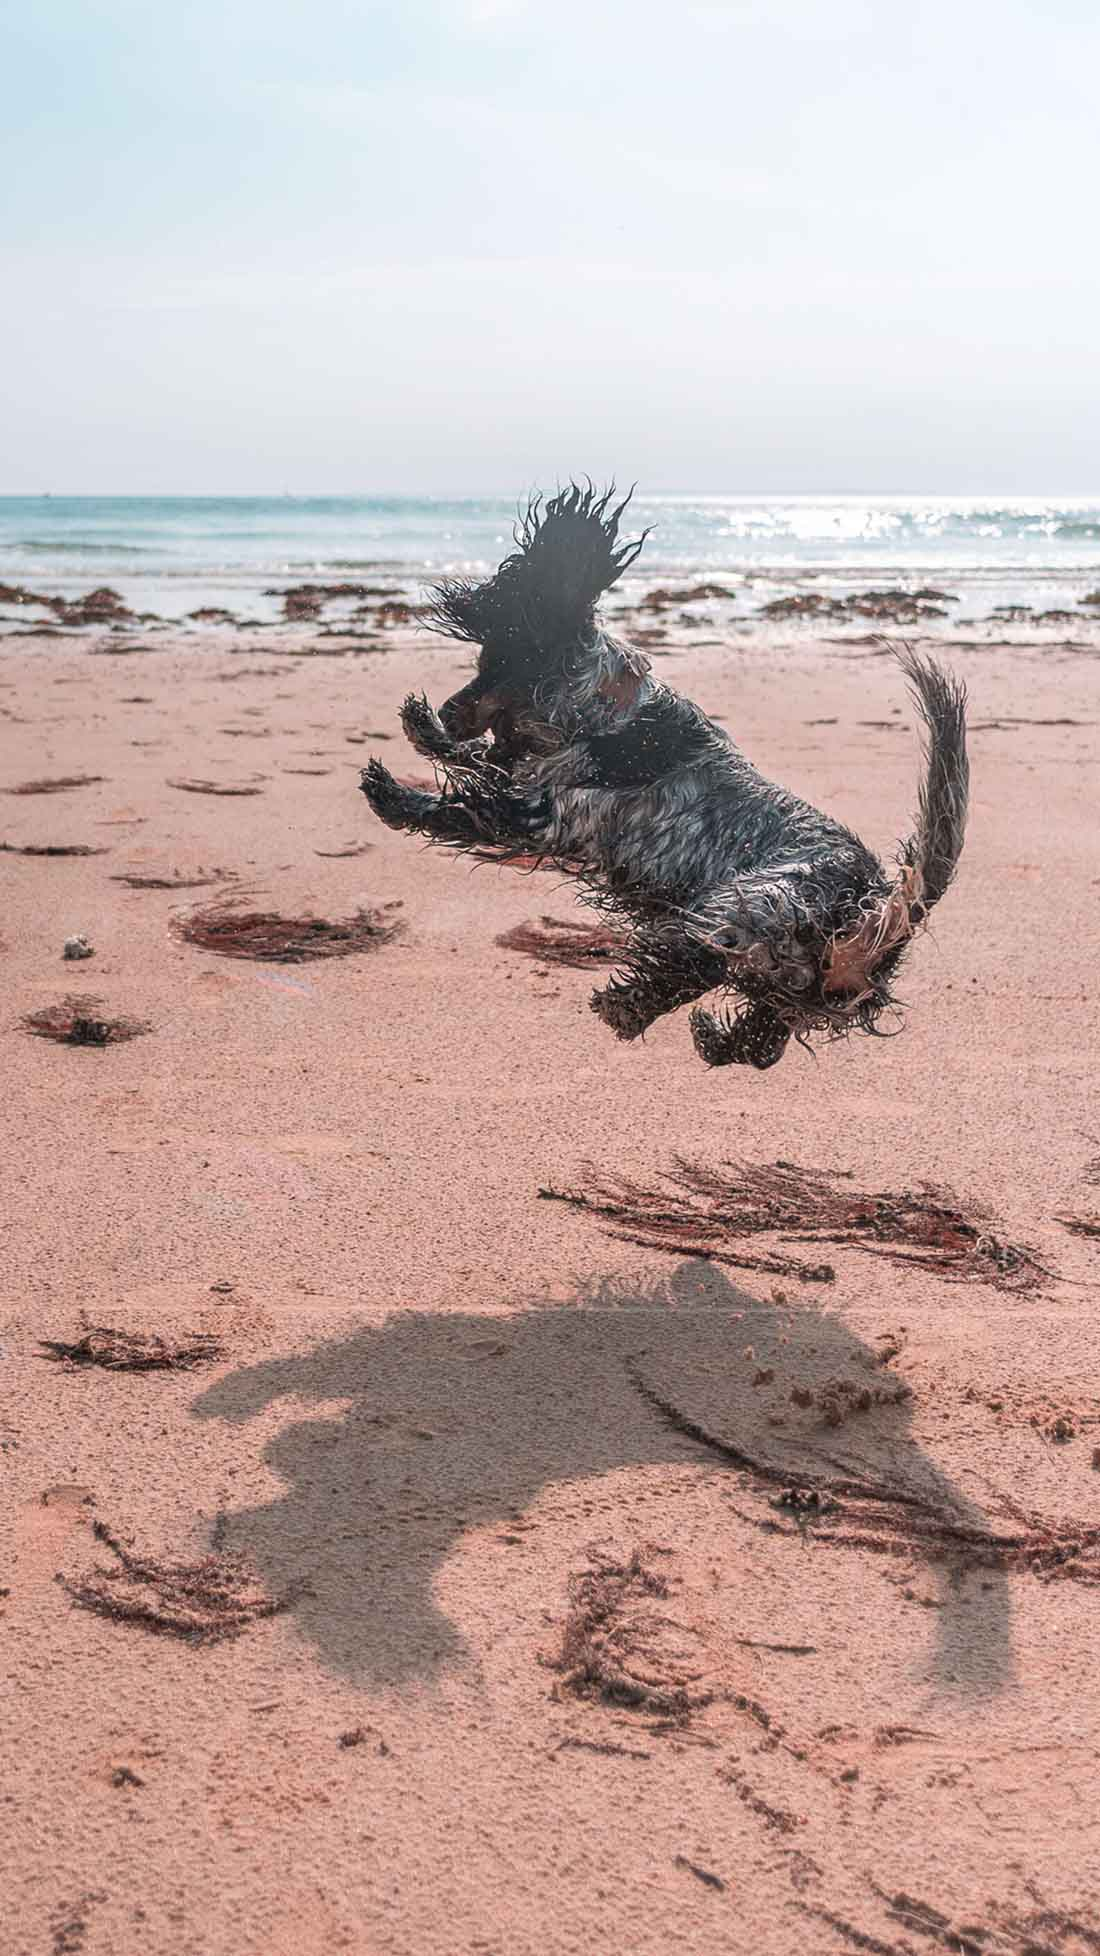 Divertido perro saltando